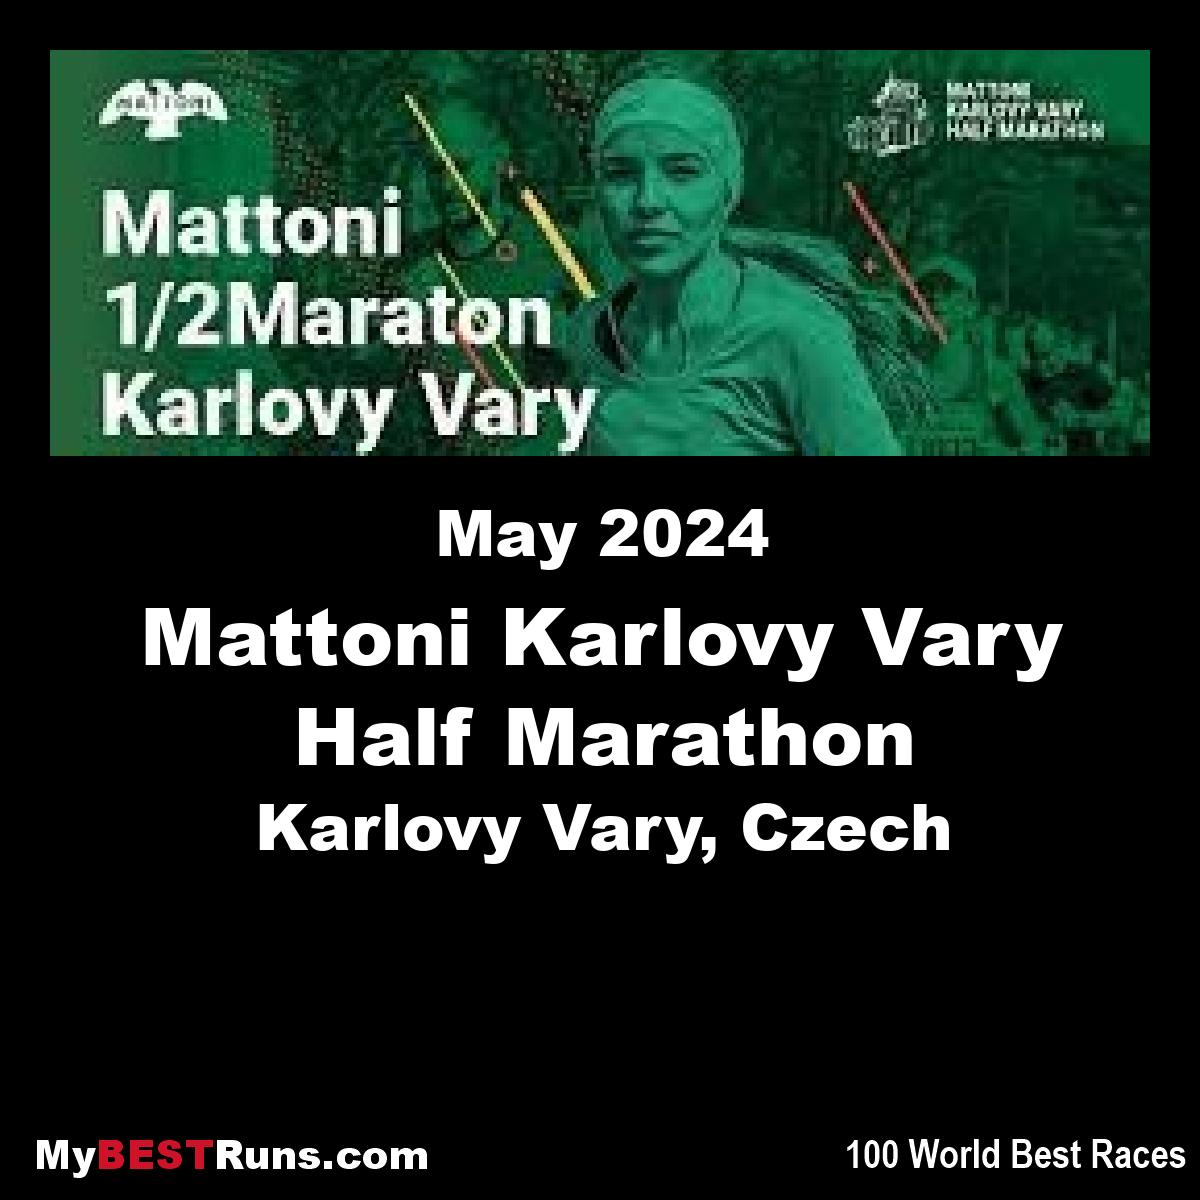 Mattoni Karlovy Vary Half Marathon